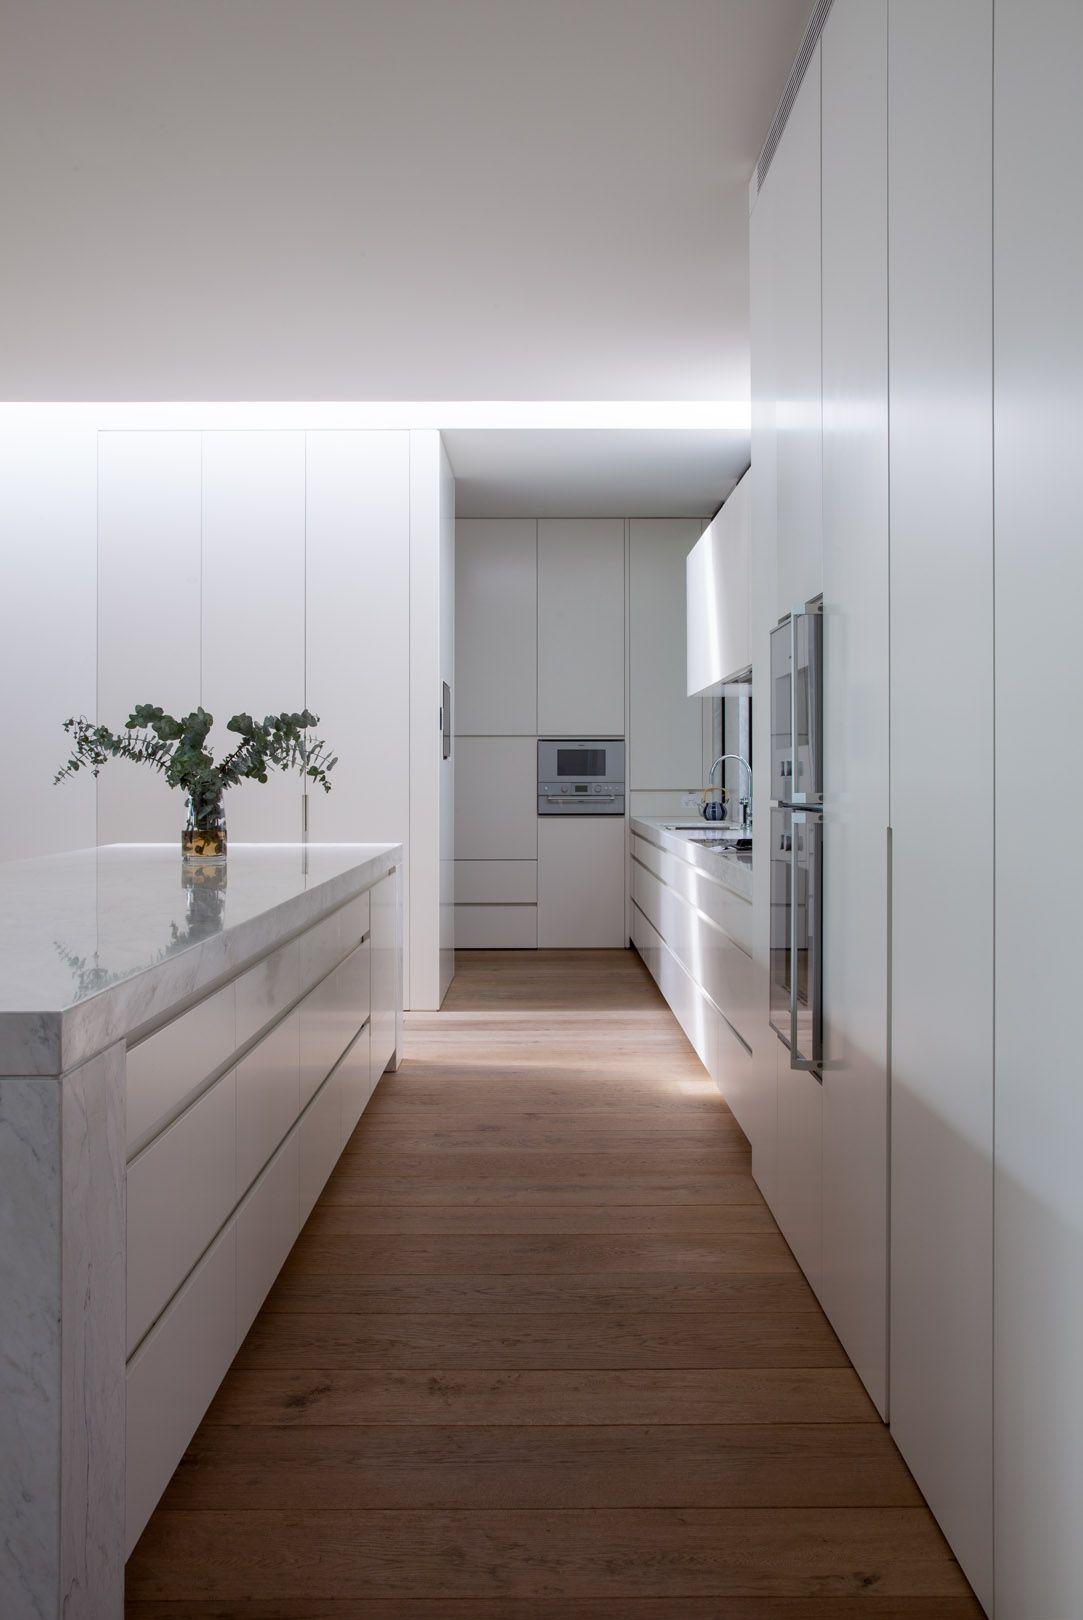 Mulgoa St_Matyas Architects_MG_1355.jpg   Interior. kitchen ...